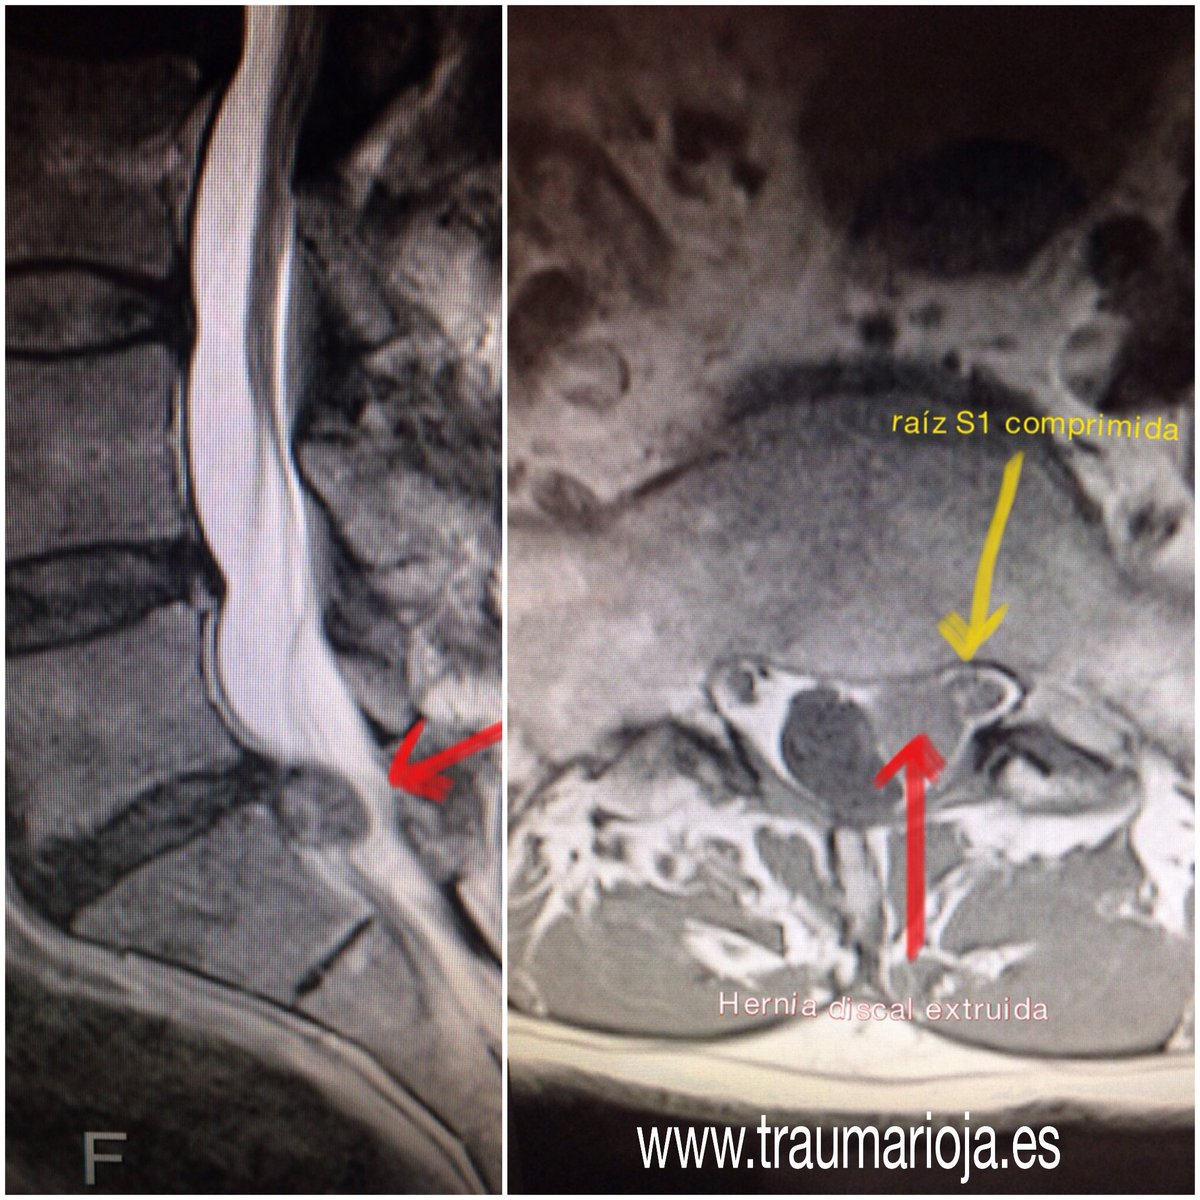 Traumatología On Twitter Hernia Discal L5 S1 Posterolateral Izquierda De Gran Tamaño Que Comprime La Raiz S1 Ipsilateral